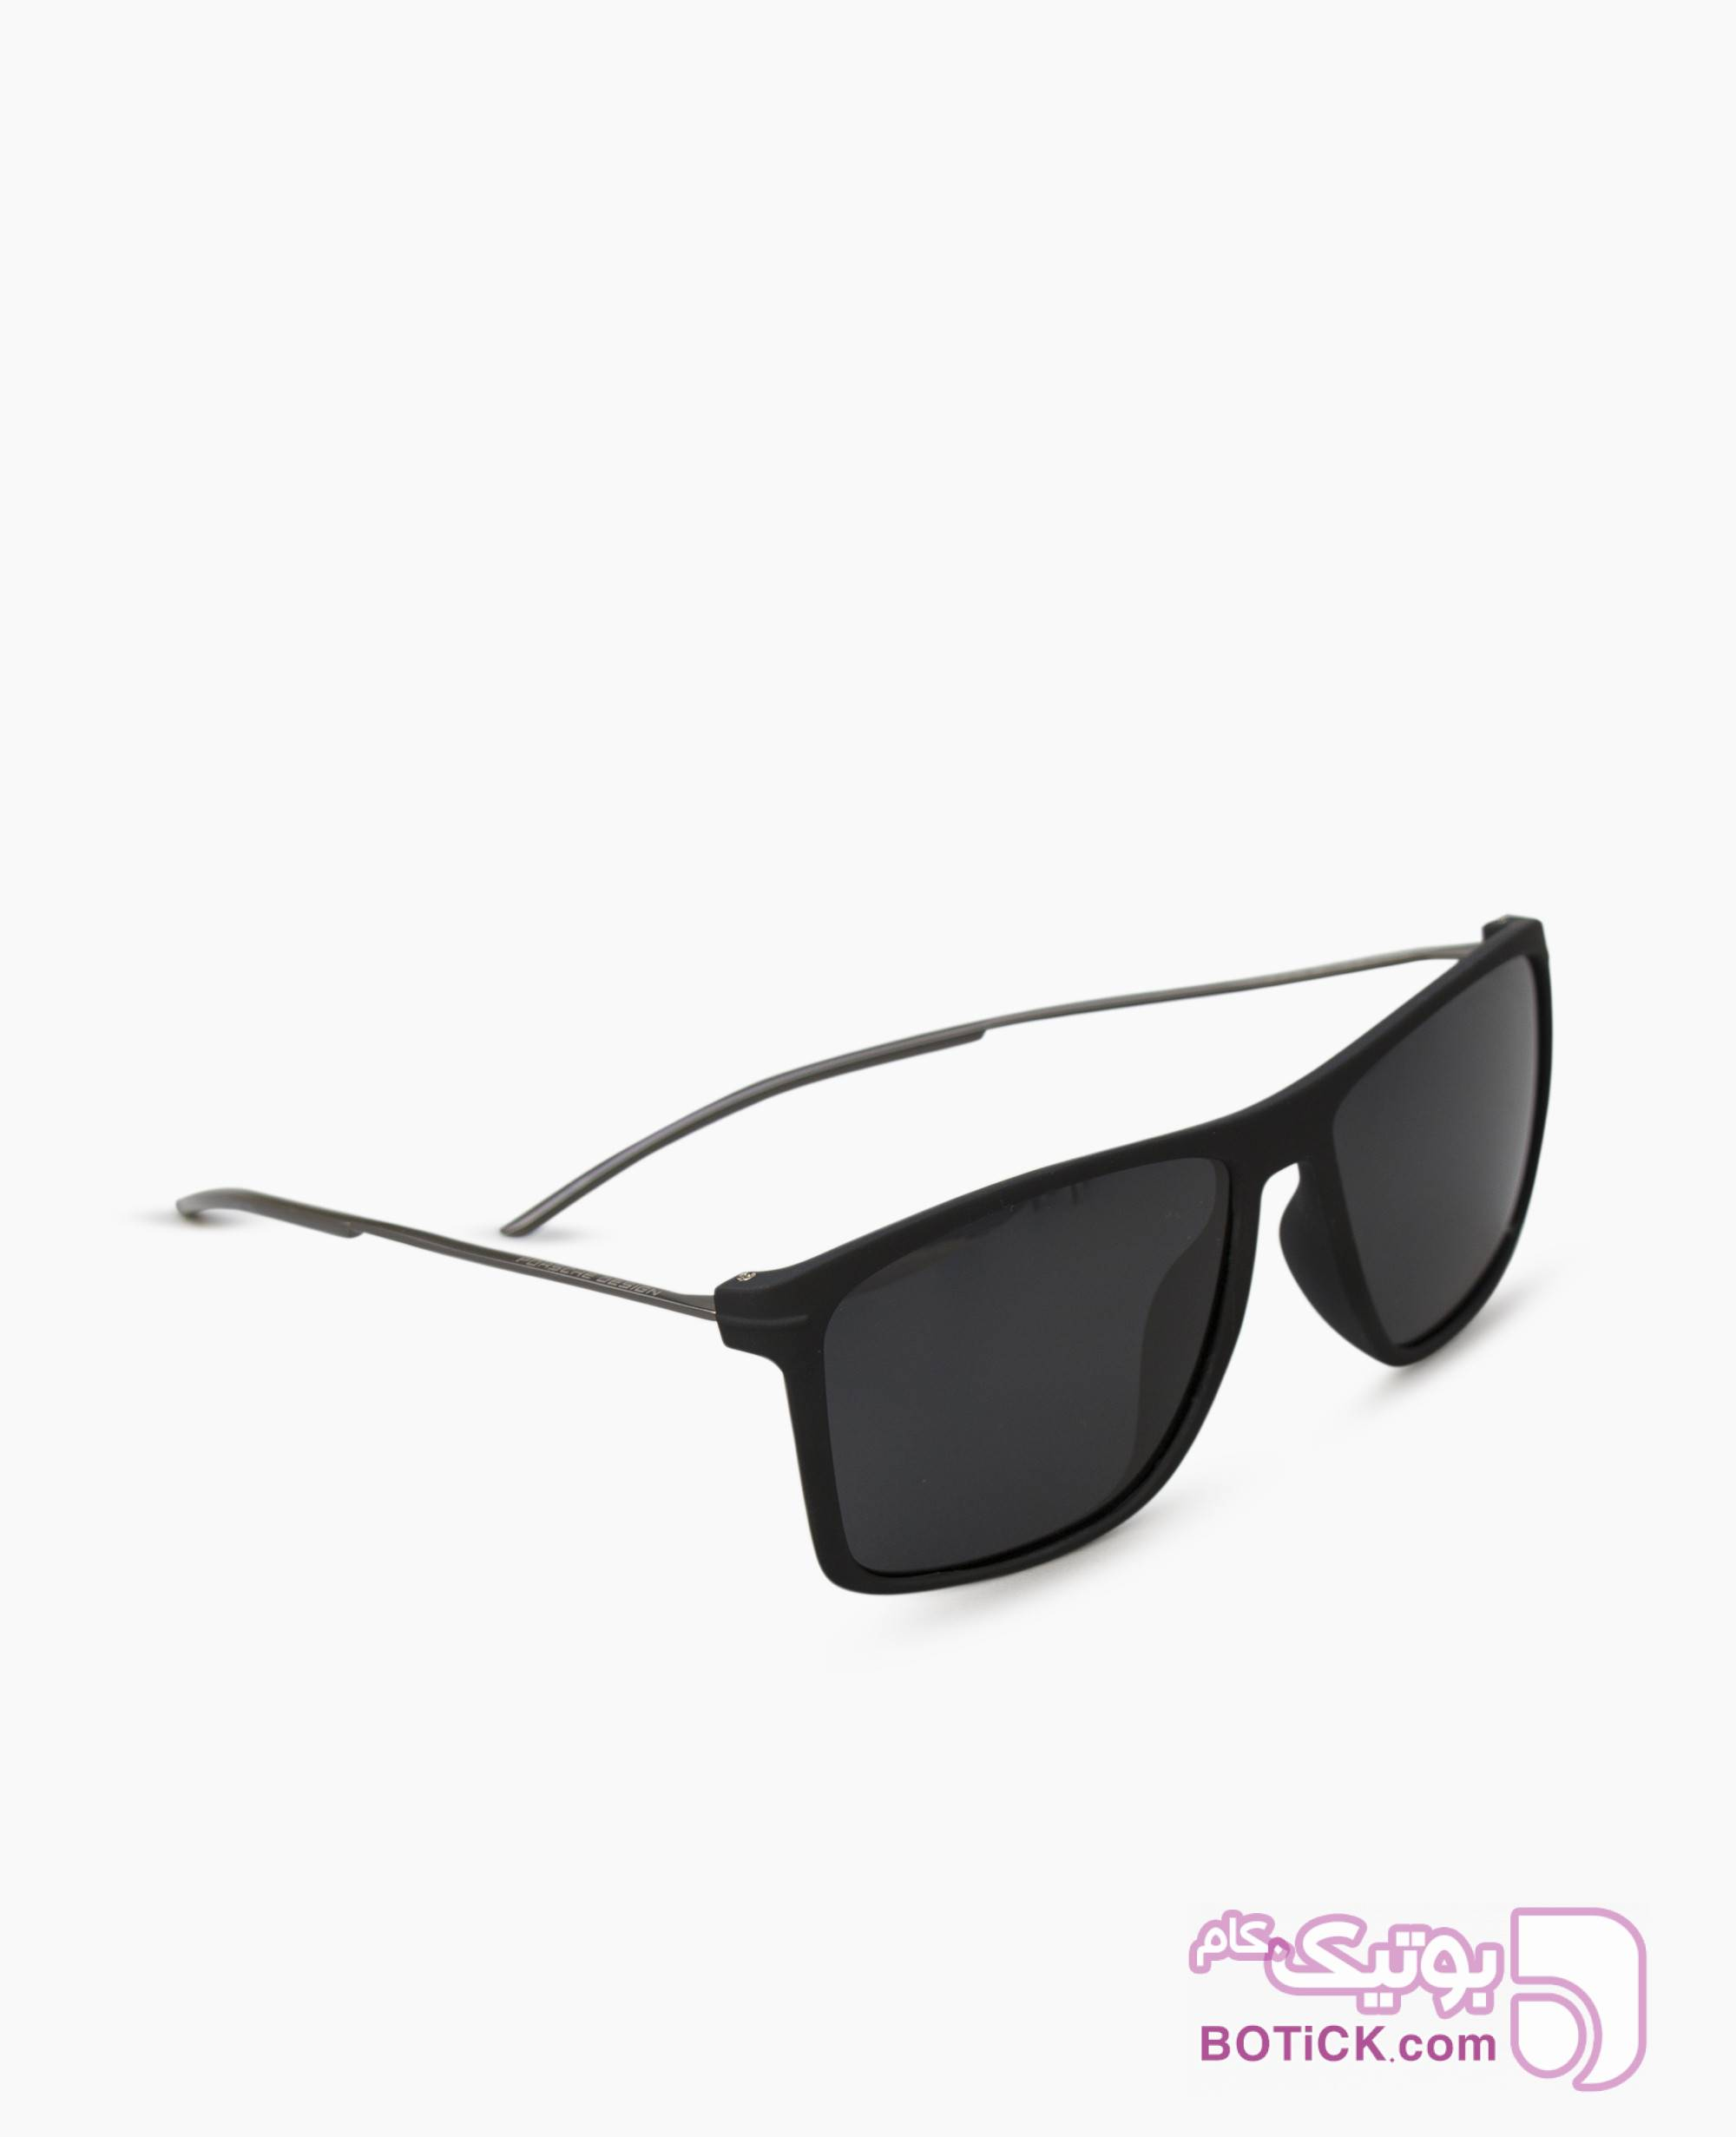 عینک آفتابی PORSCHE DESIGN کد 0327 مشکی عینک آفتابی